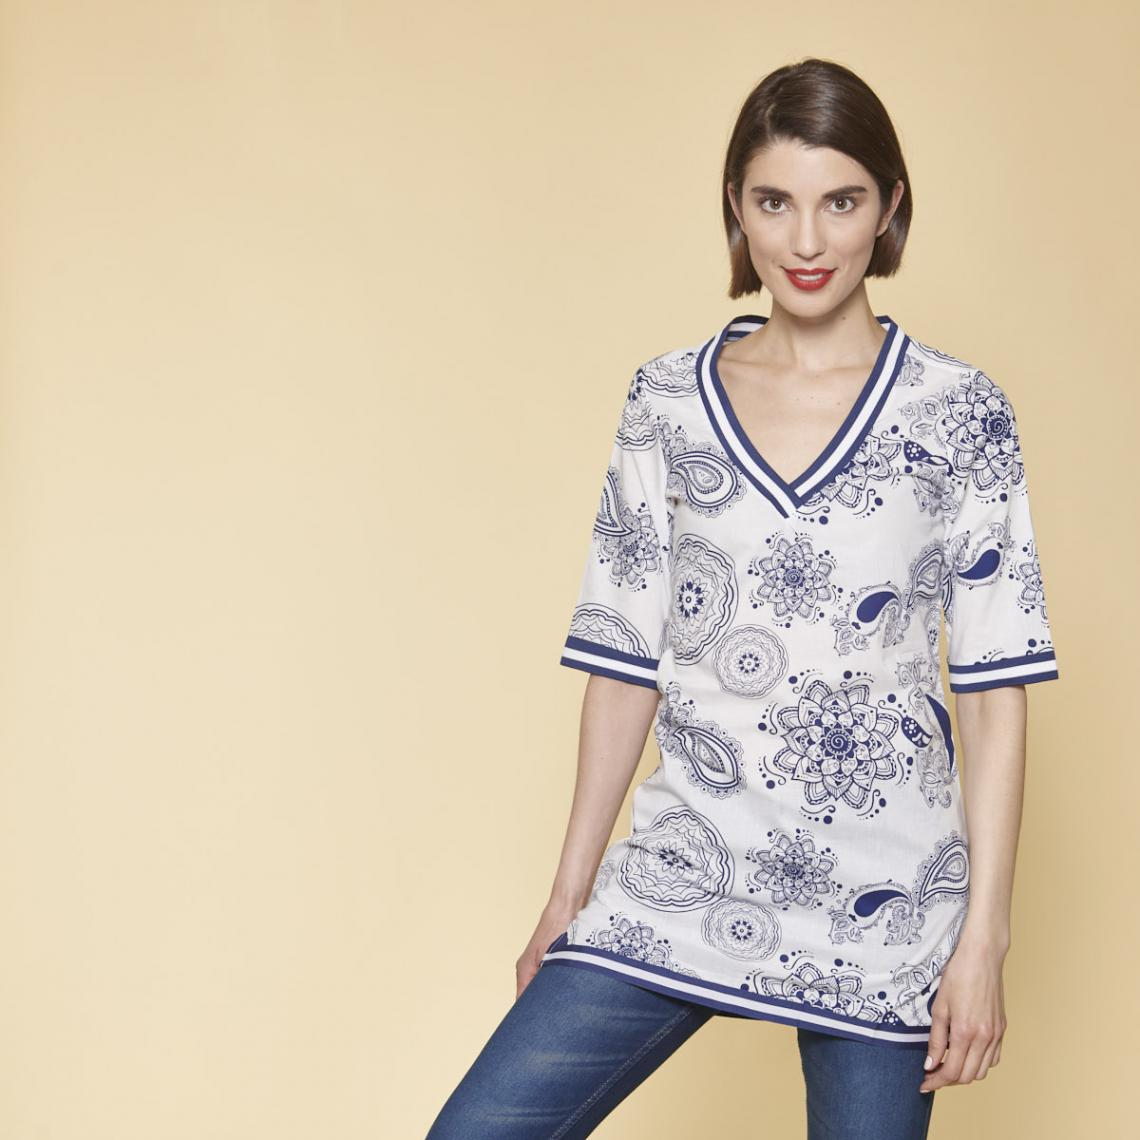 Robe Tunique Imprimee Femme Imprime Bleu 3 Suisses